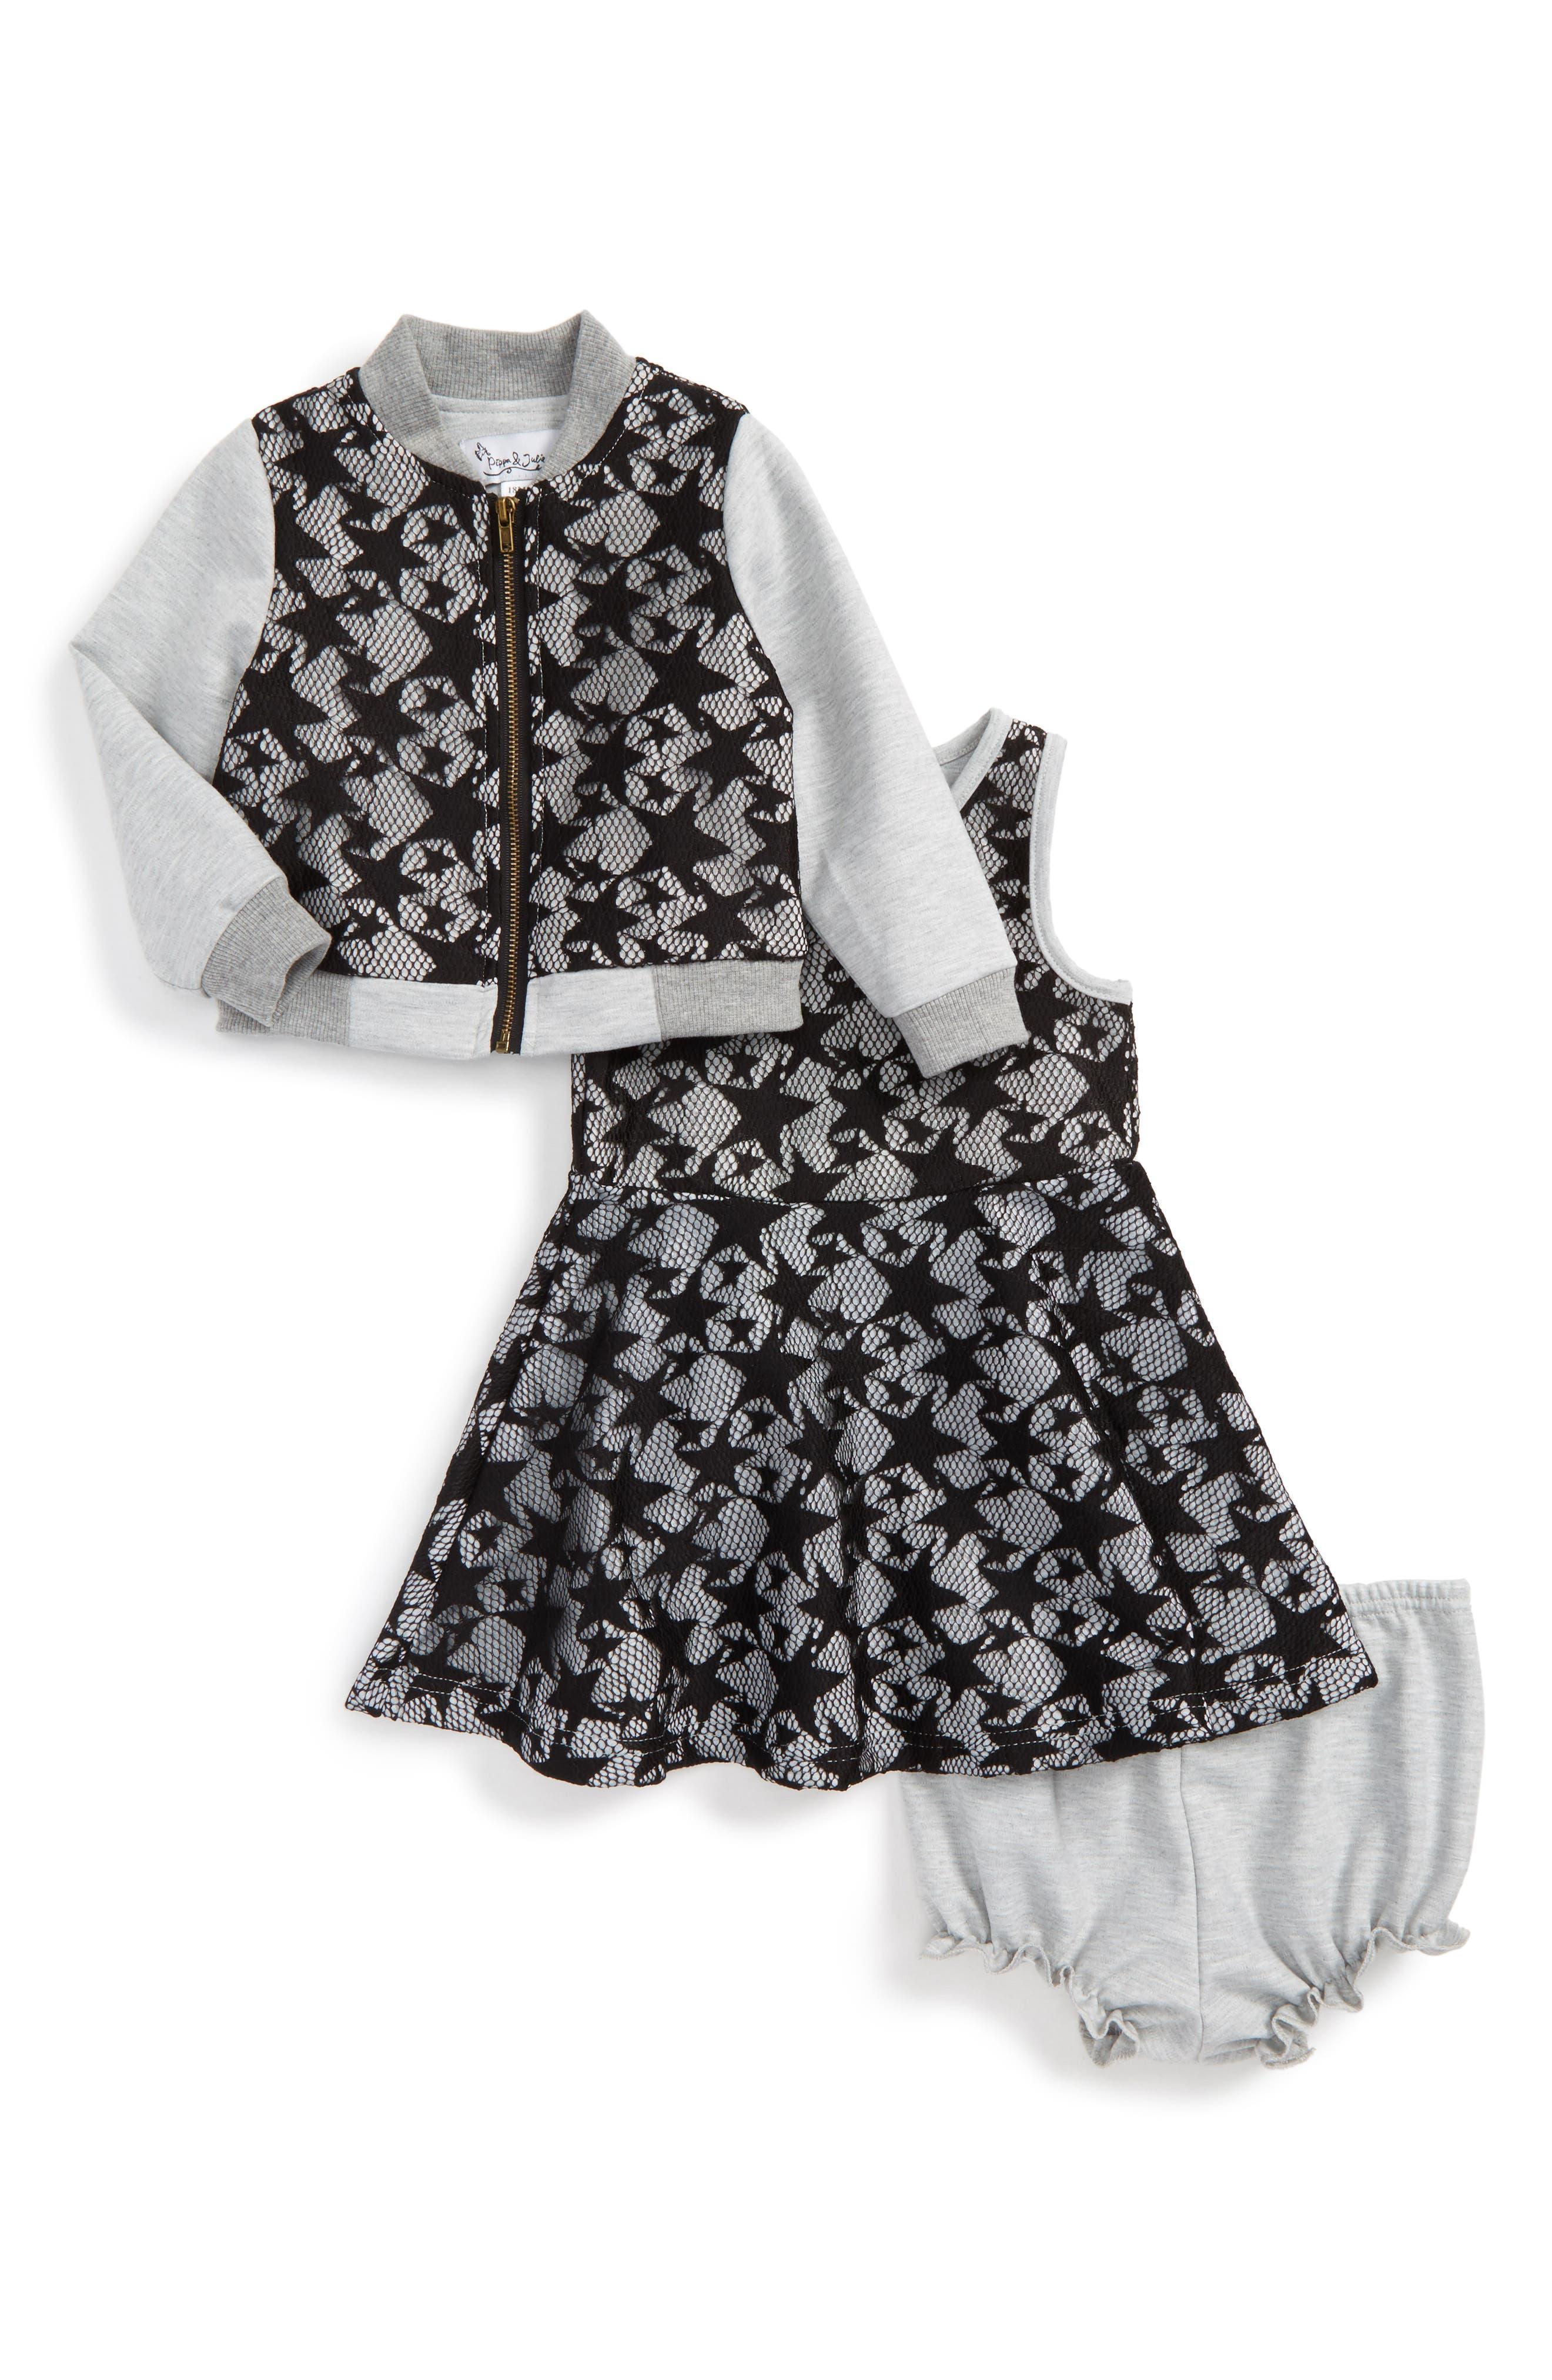 Star Lace Jacket & Dress Set,                         Main,                         color, Black/ Grey